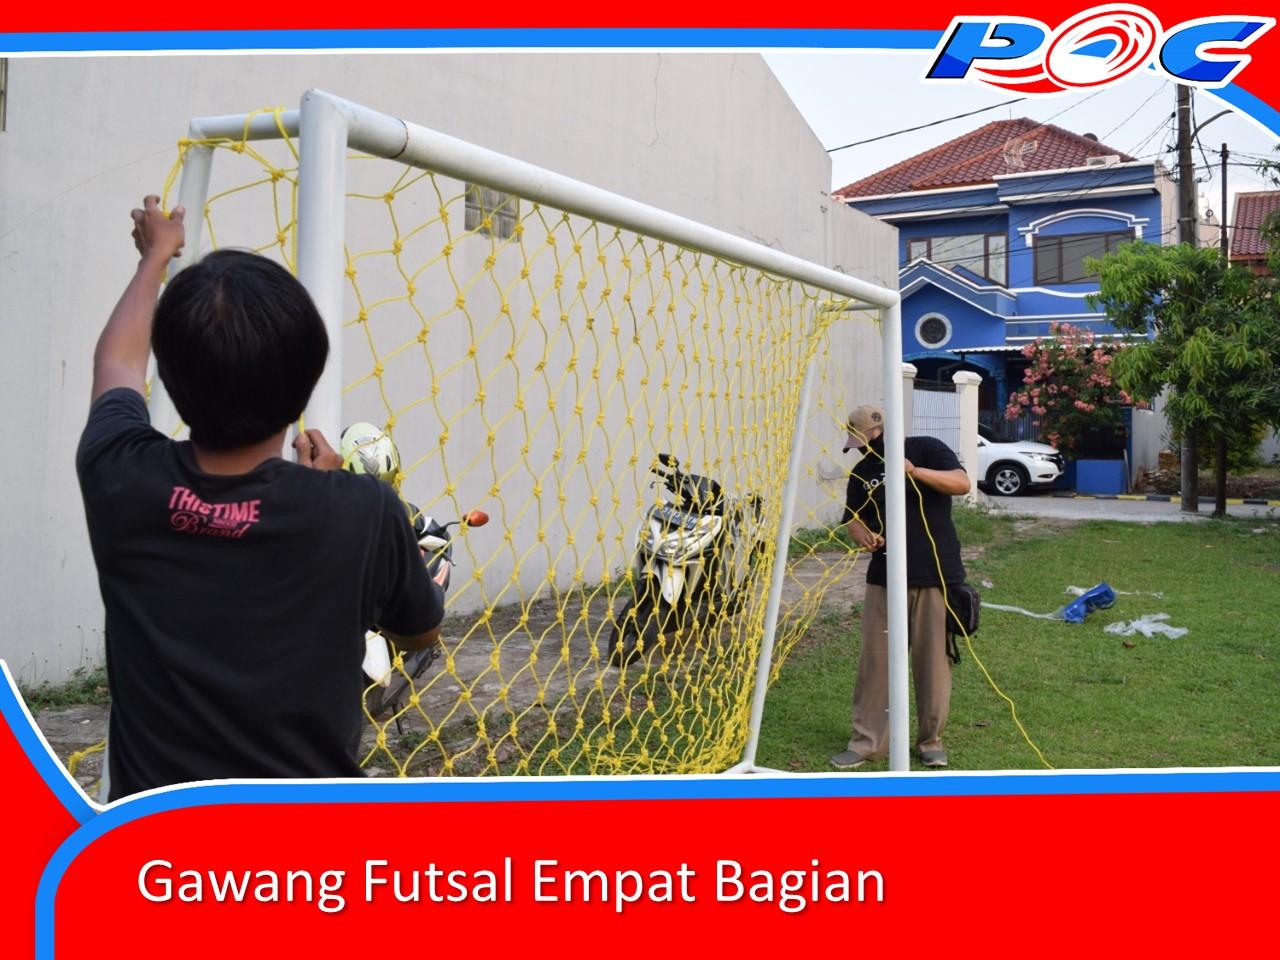 Gawang Futsal Empat Bagian